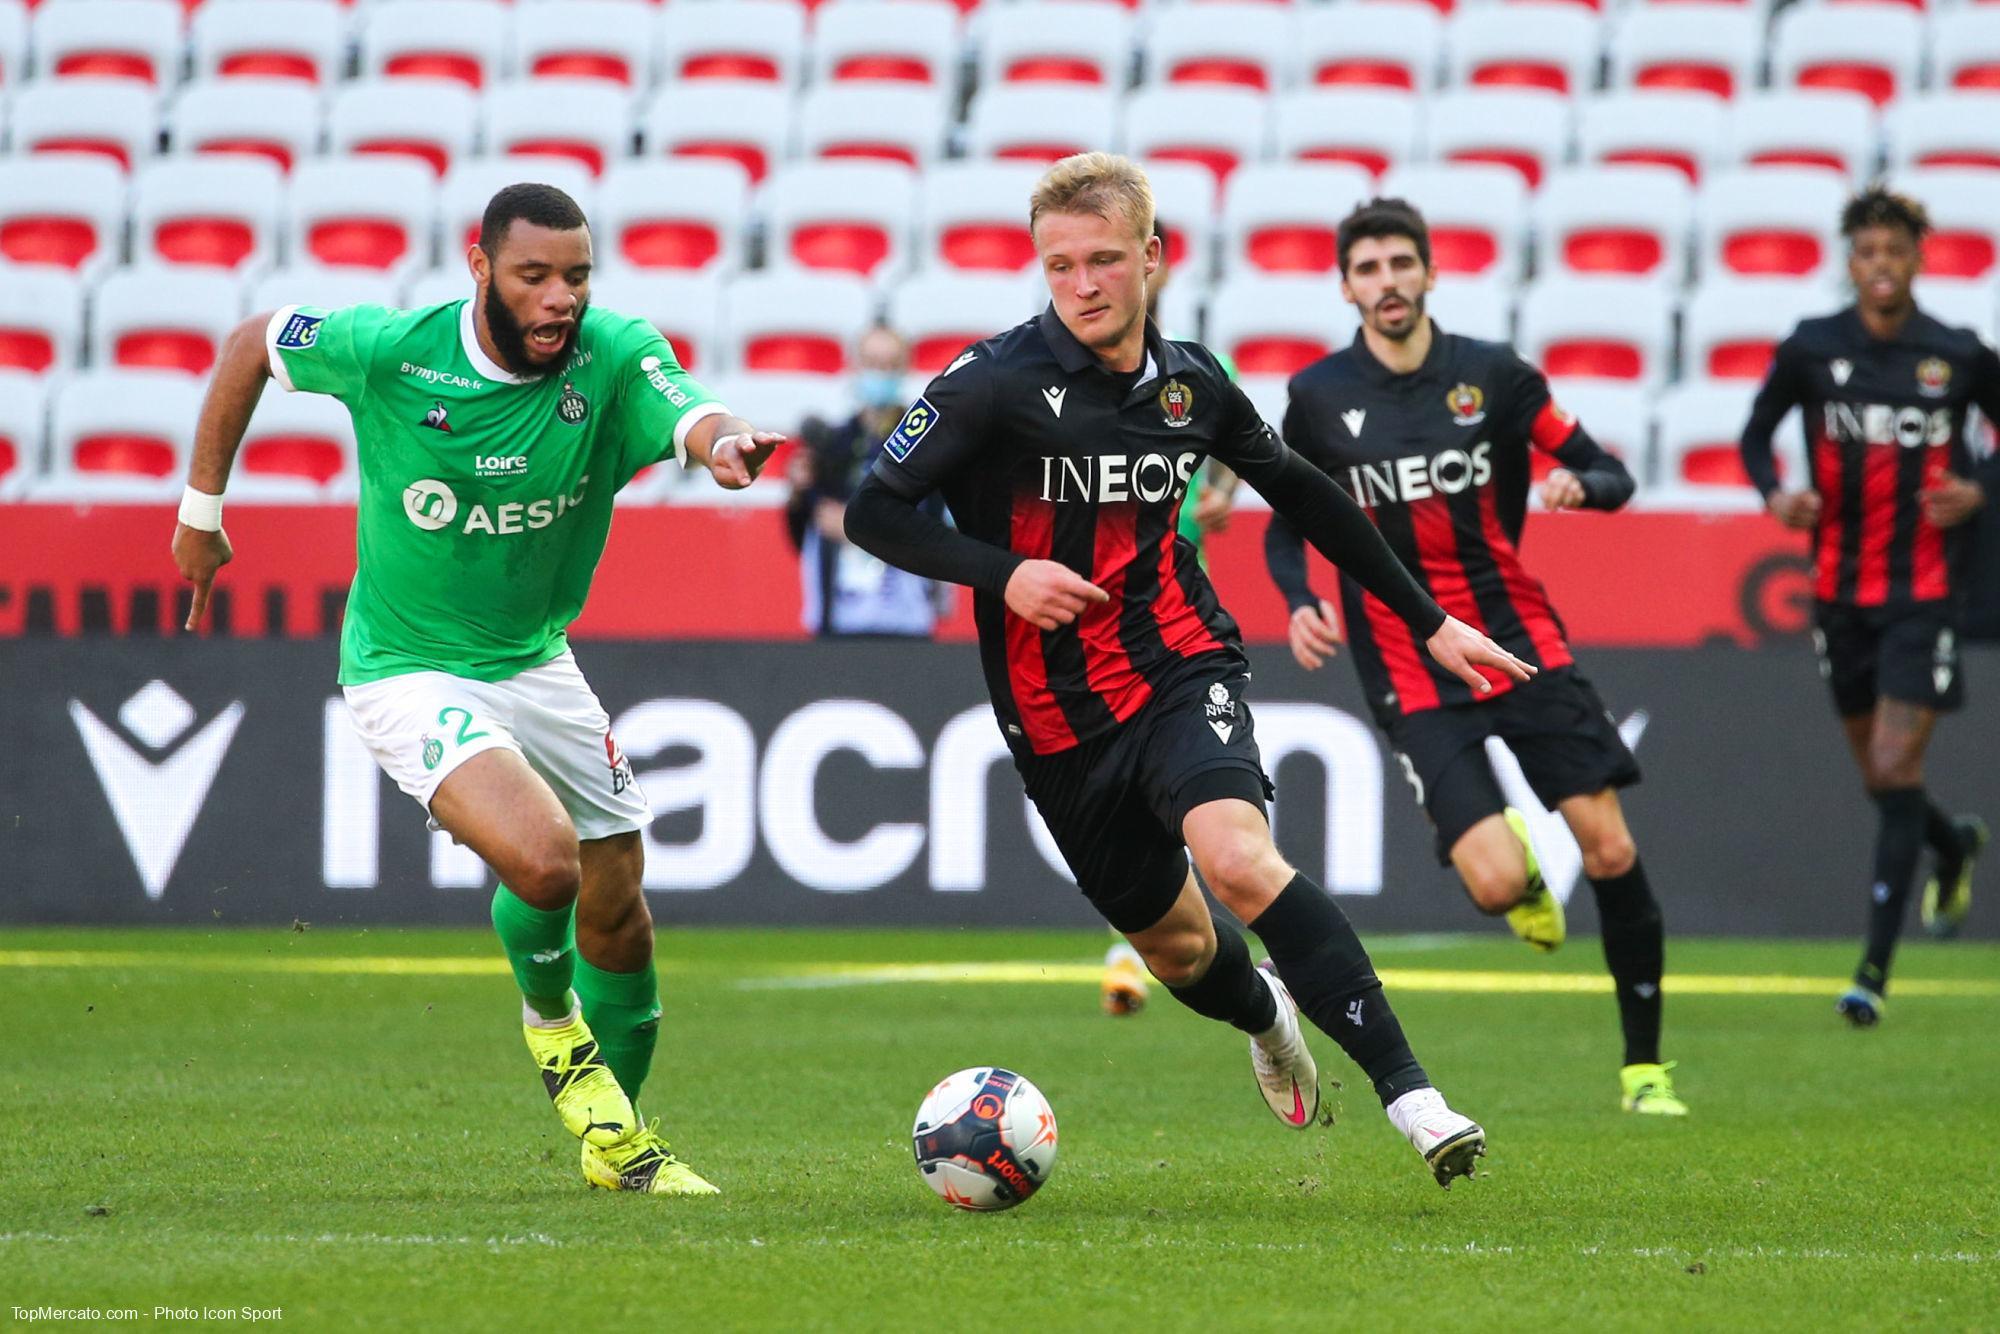 Kasper Dolberg et Harold Moukoudi, match Nice - ASSE Saint-Etienne